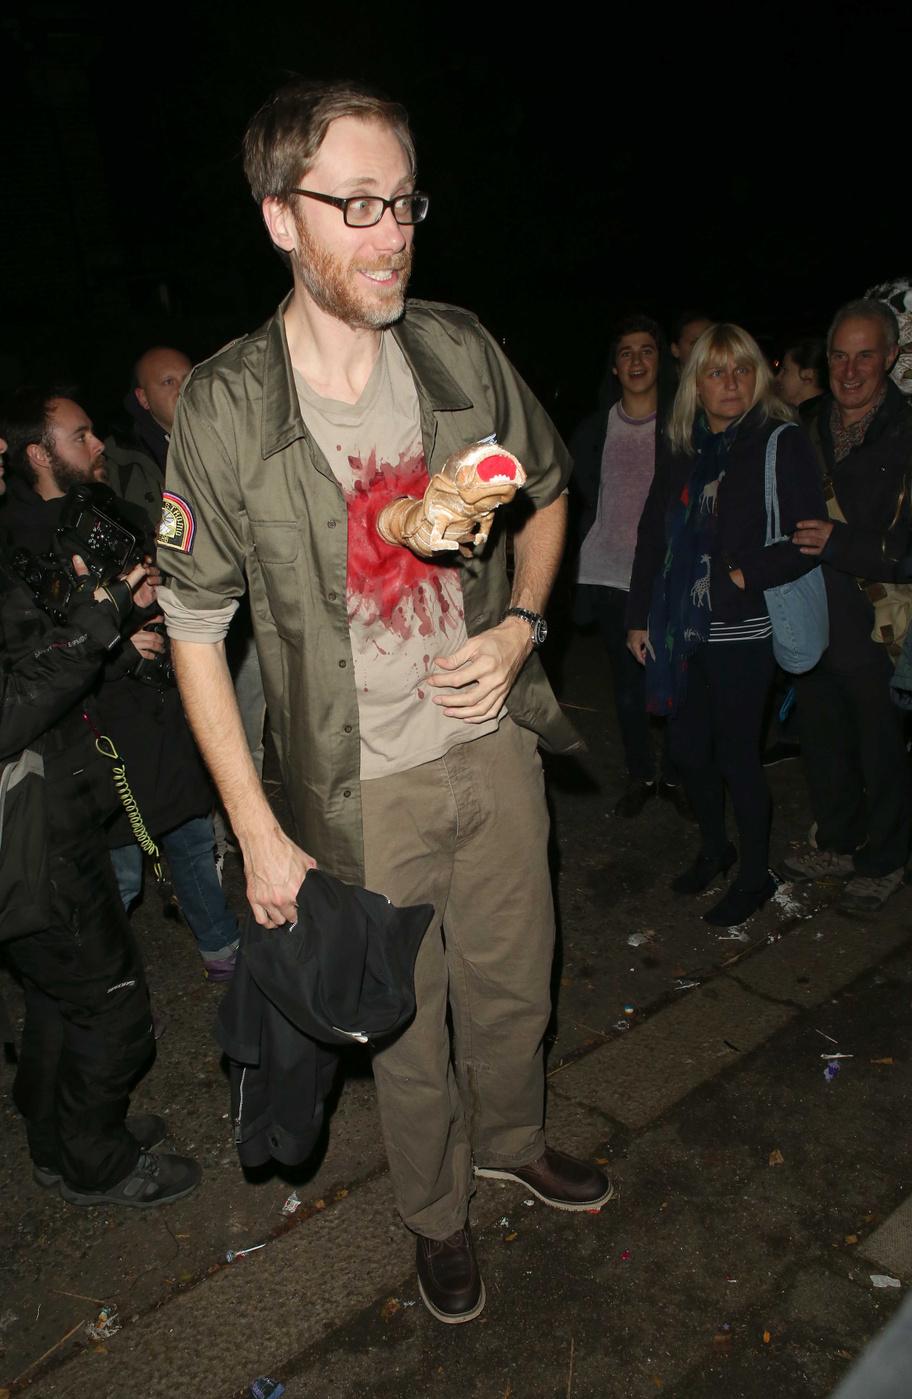 Cele|bitchy | Stephen Merchant dressed as John Hurt from Alien ...